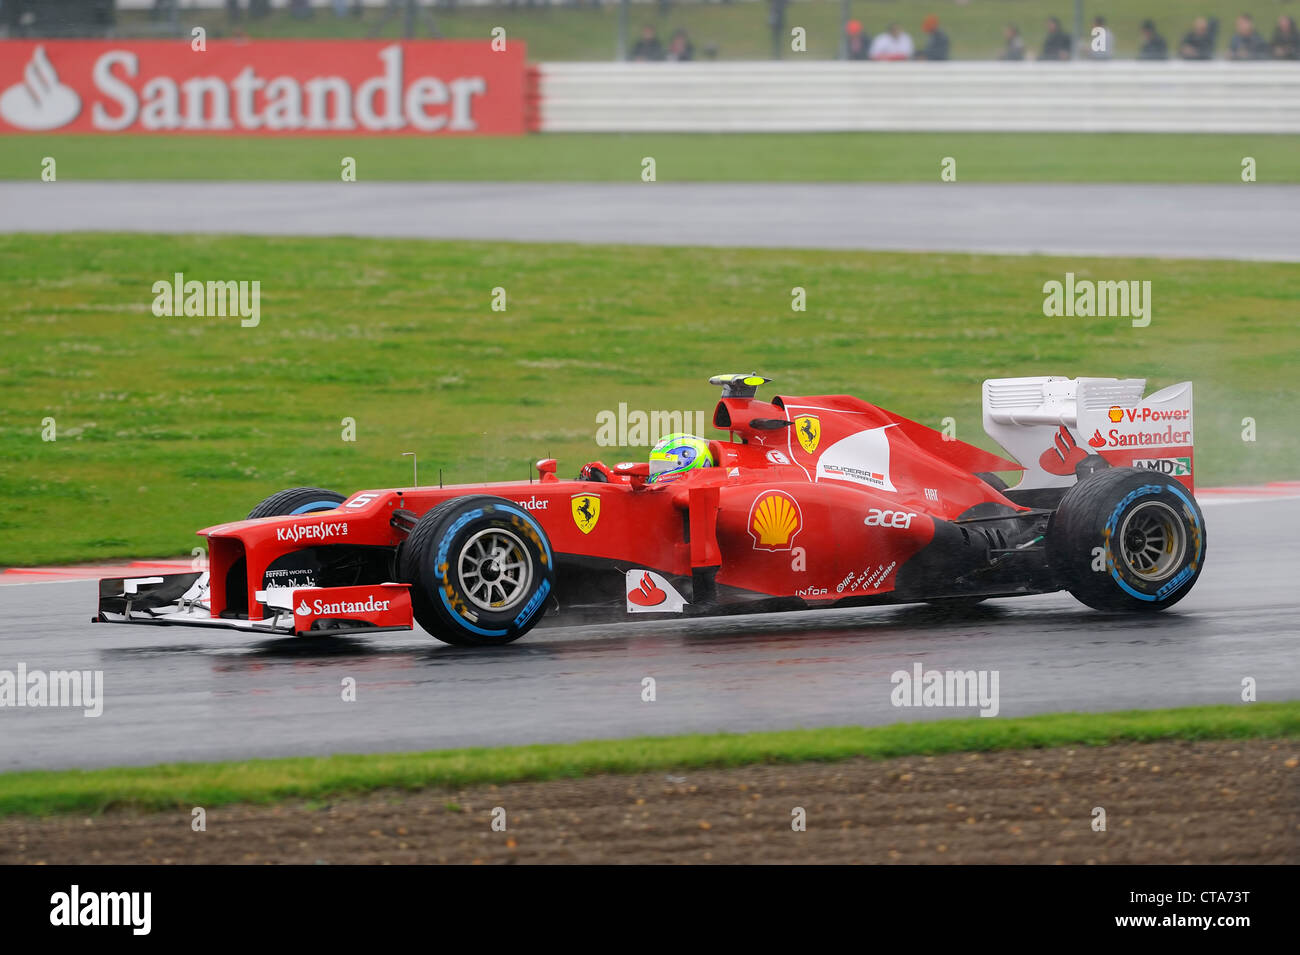 Ferrari F1 2012 Stock Photo Alamy